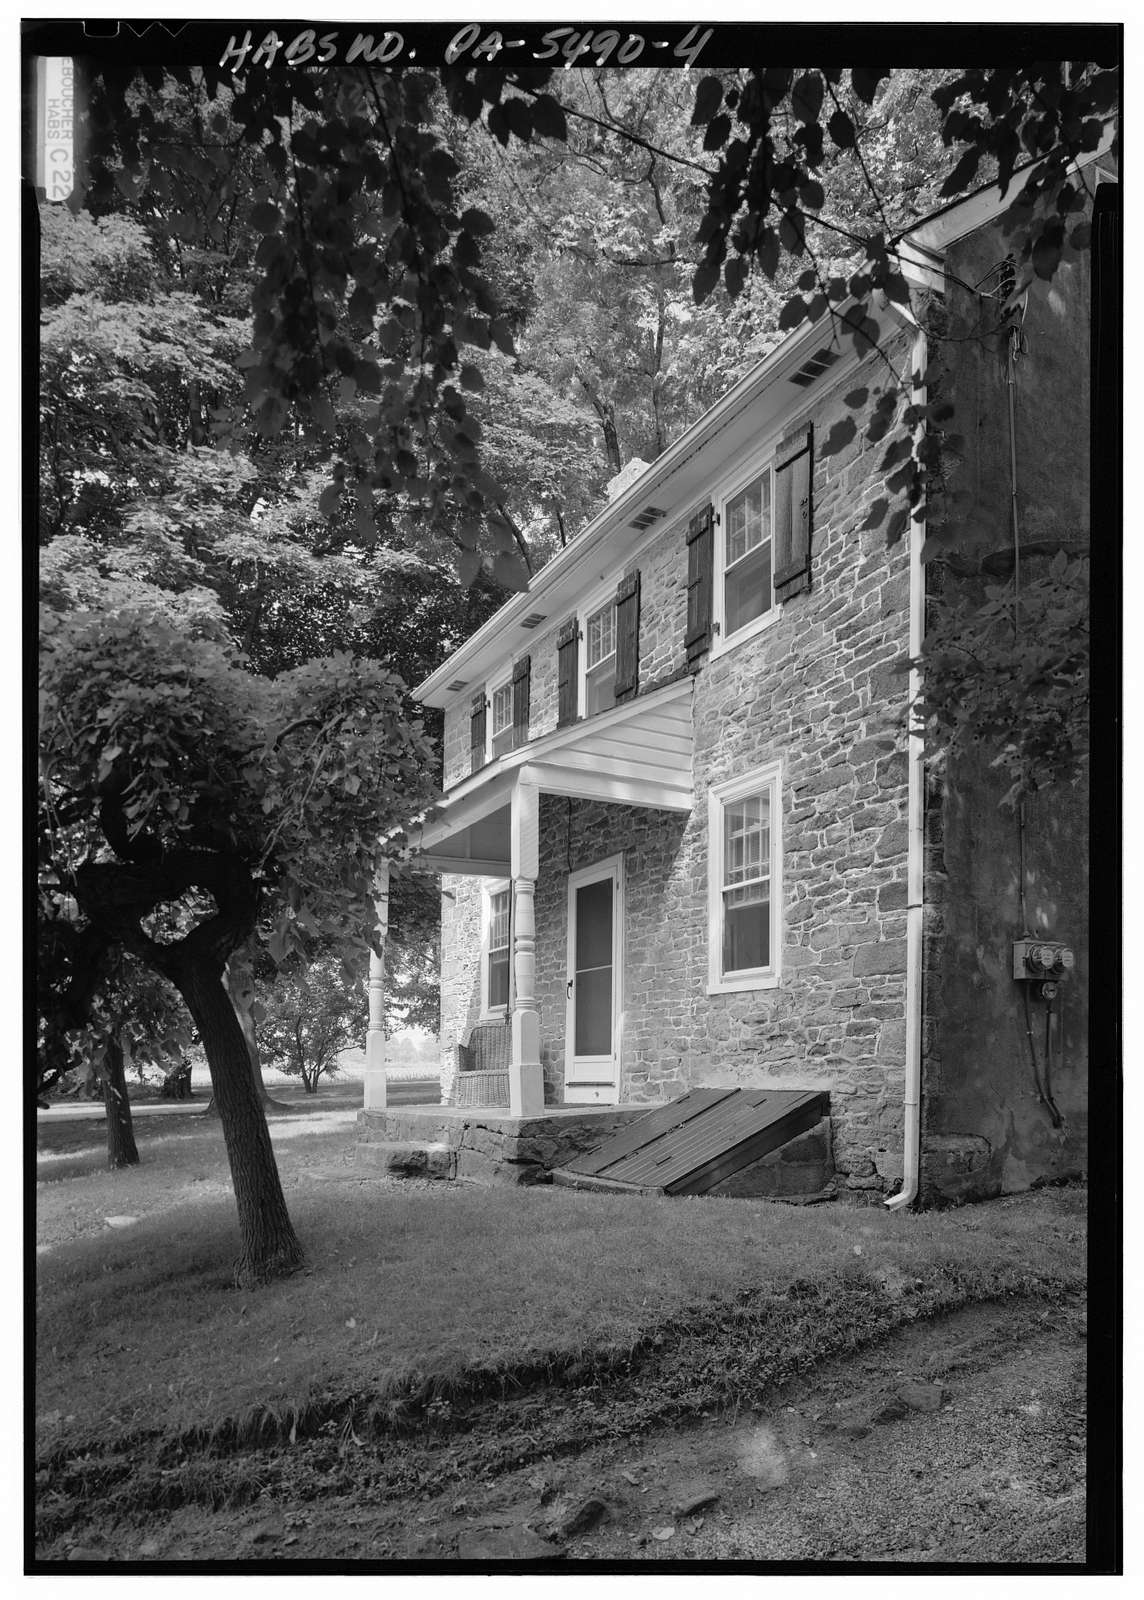 Miller's House, Dead end Tollgate Road, Core Creek Park (Middletown Township), Langhorne, Bucks County, PA